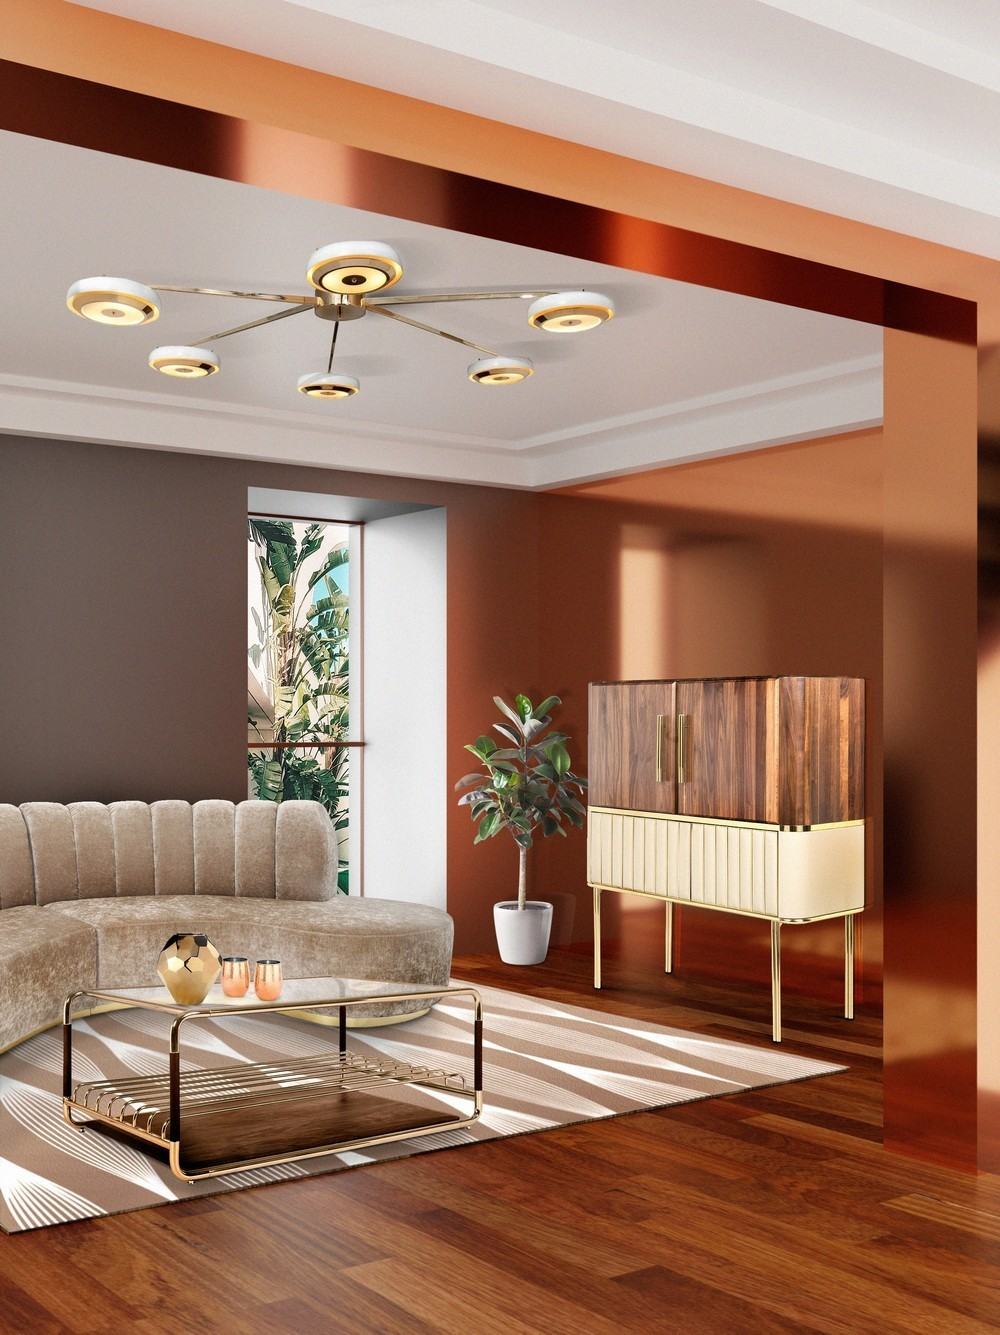 Diseño de Gabinetes: Ideas poderosas de interiores modernos diseño de gabinetes Diseño de Gabinetes: Ideas poderosas de interiores modernos sala de estar 15 final min